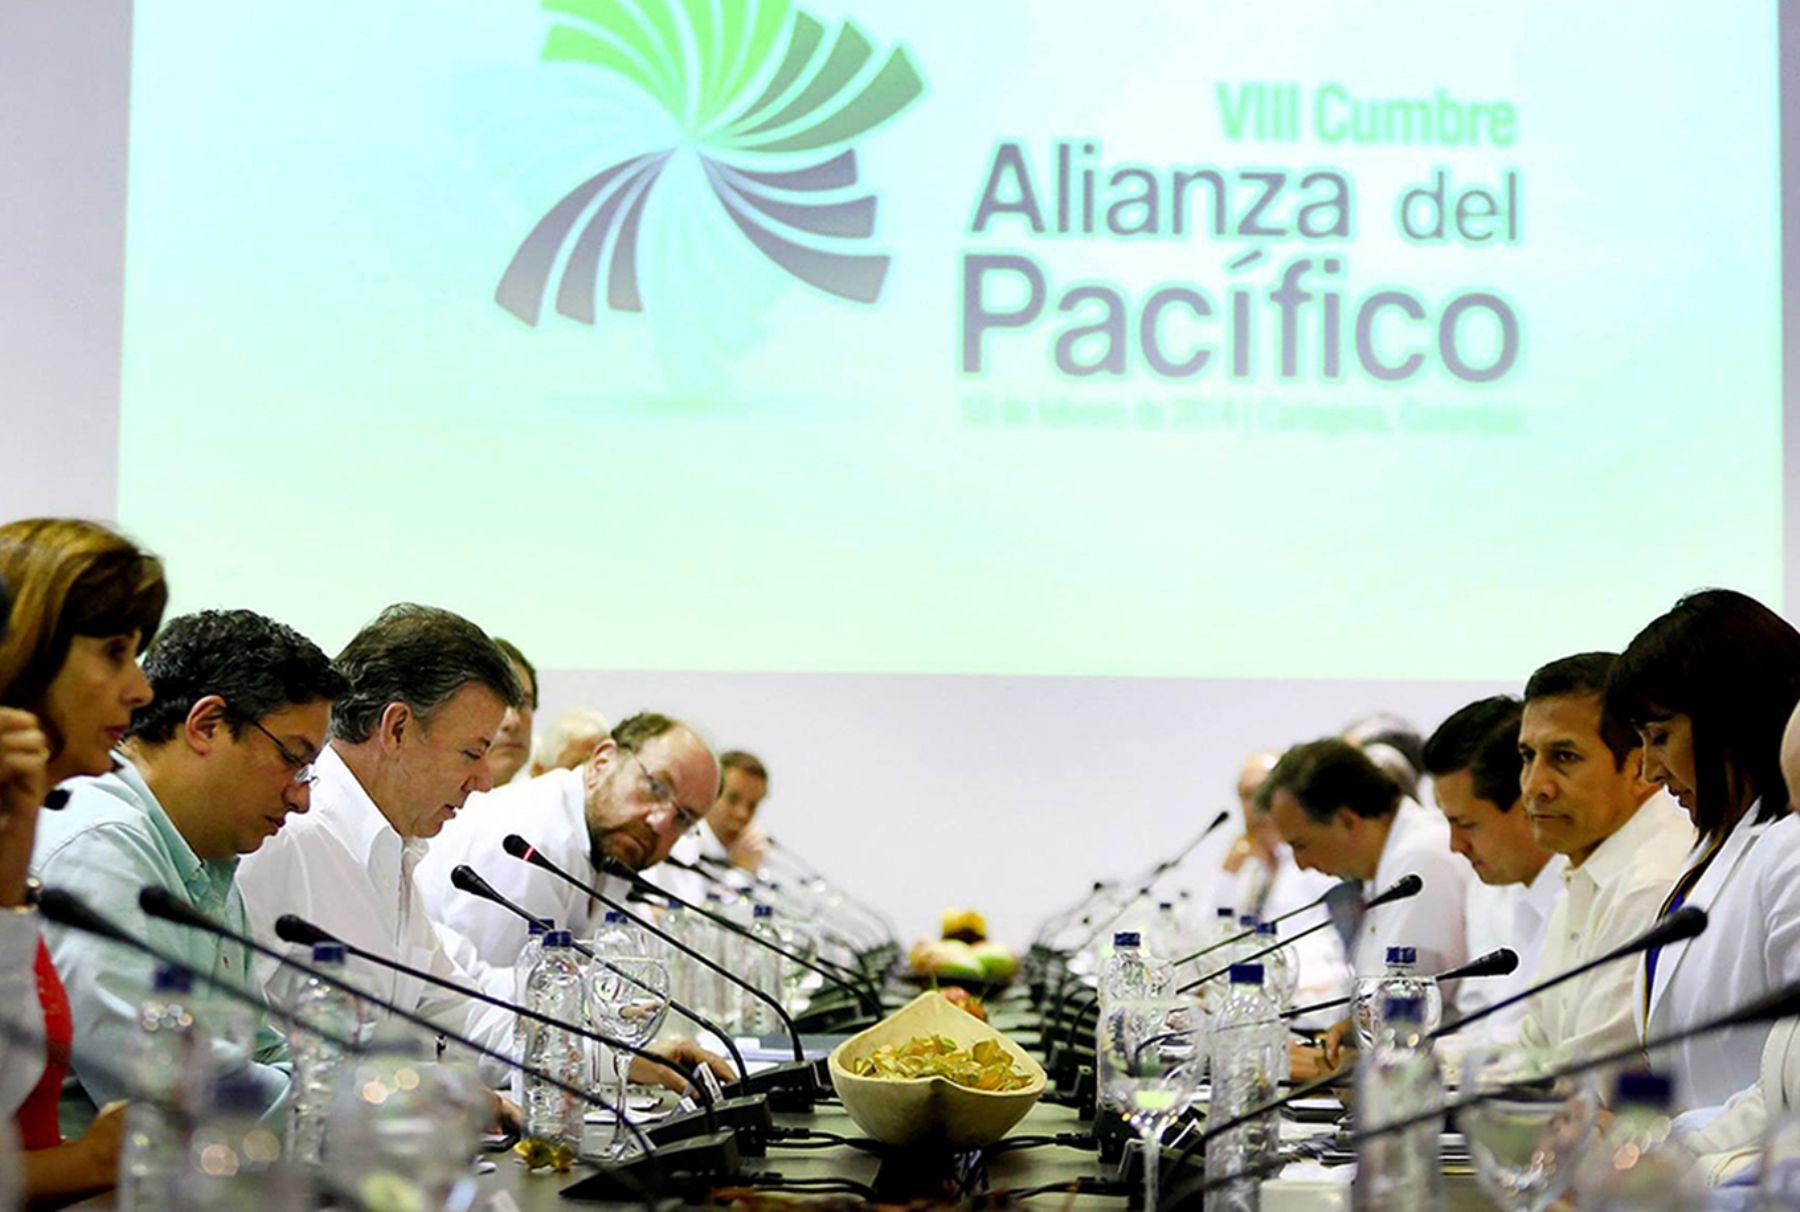 Presidente Humala participa en VIII Cumbre de Alianza del Pacífico, ANDINA/Prensa Presidencia